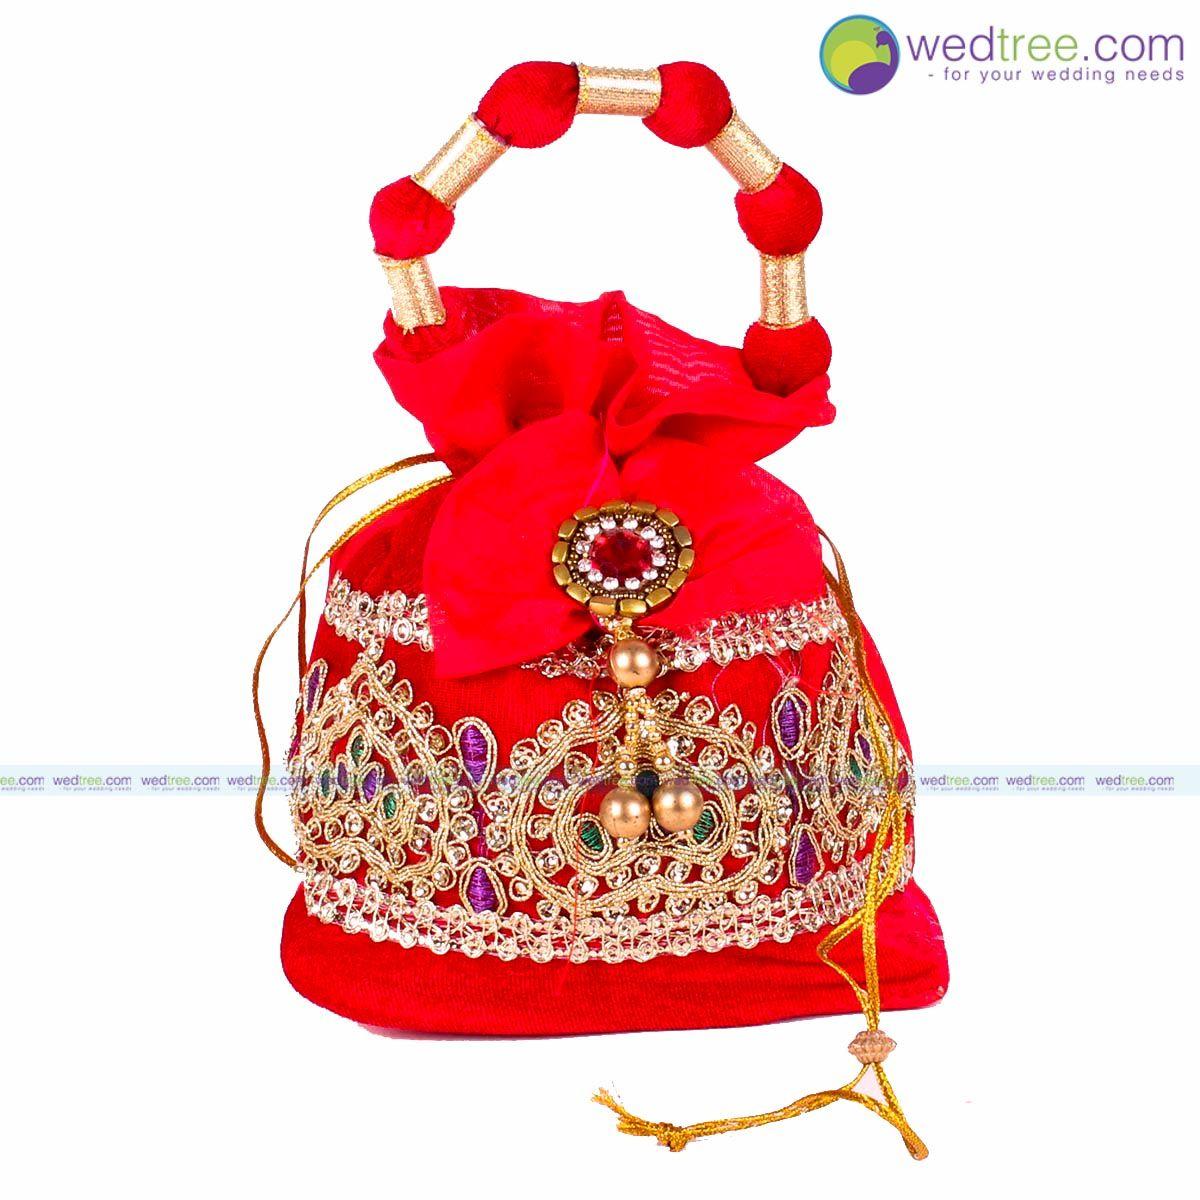 Potli Bag Velvet Rich Golden Zari With Bow Wedding